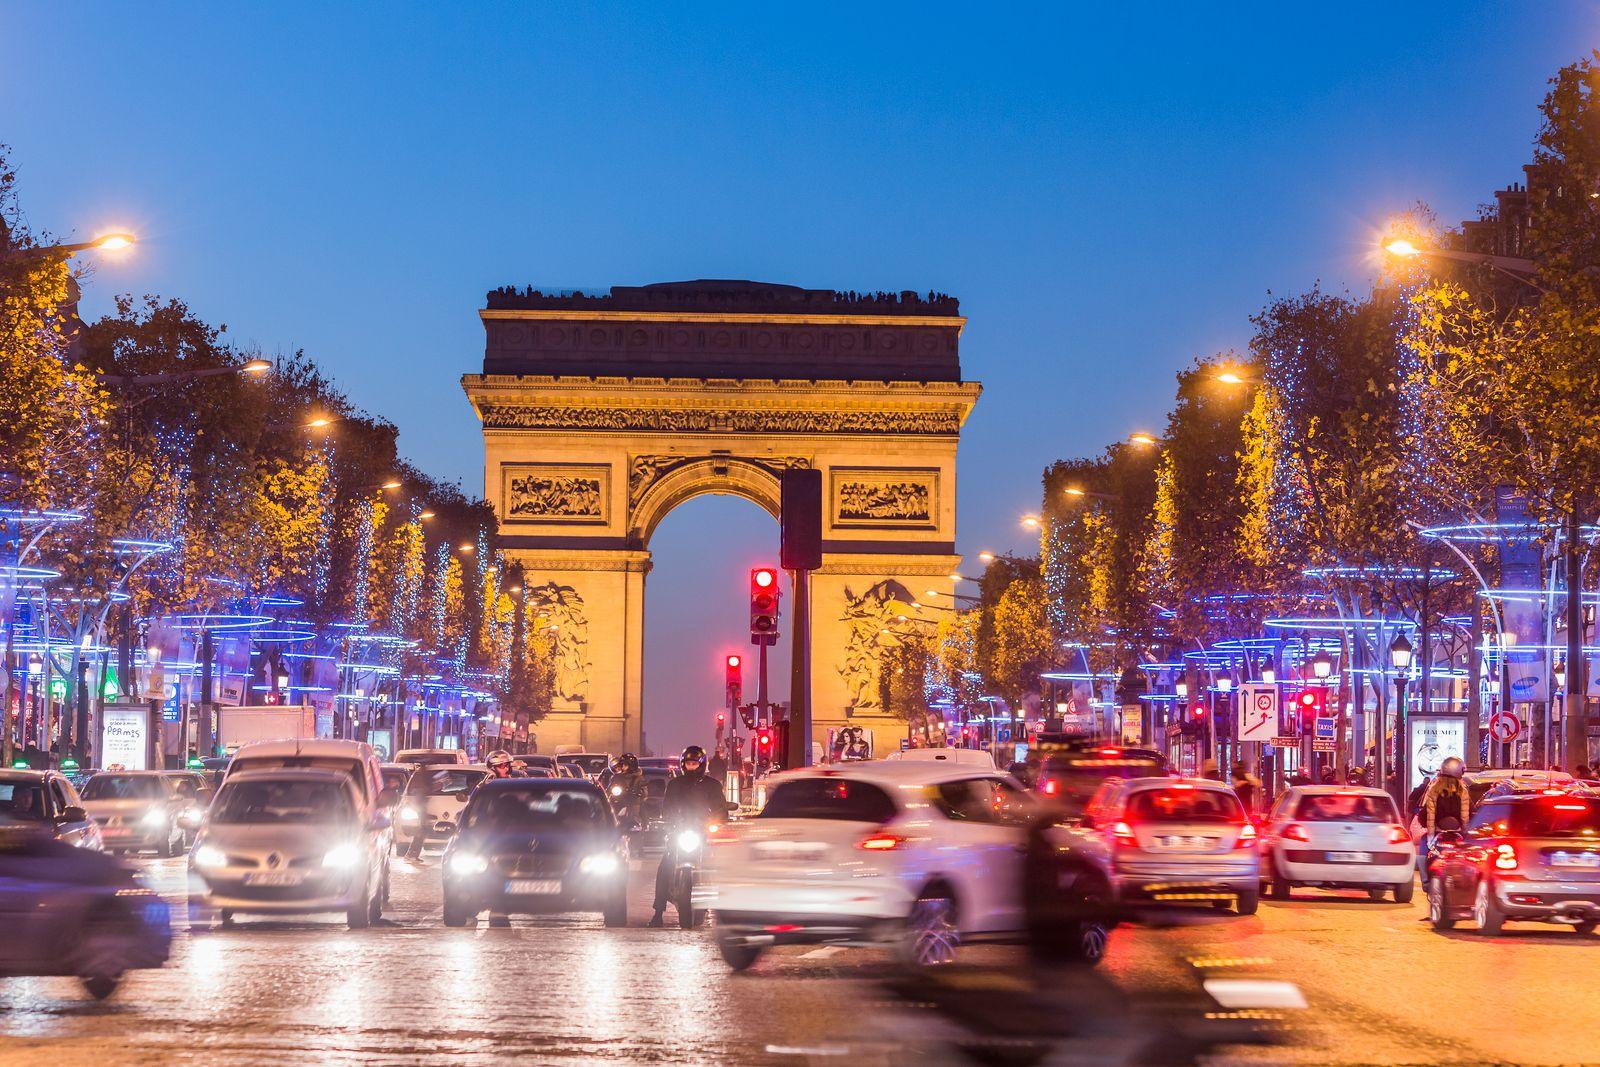 Champs-Elysées, traffic during Christmas period